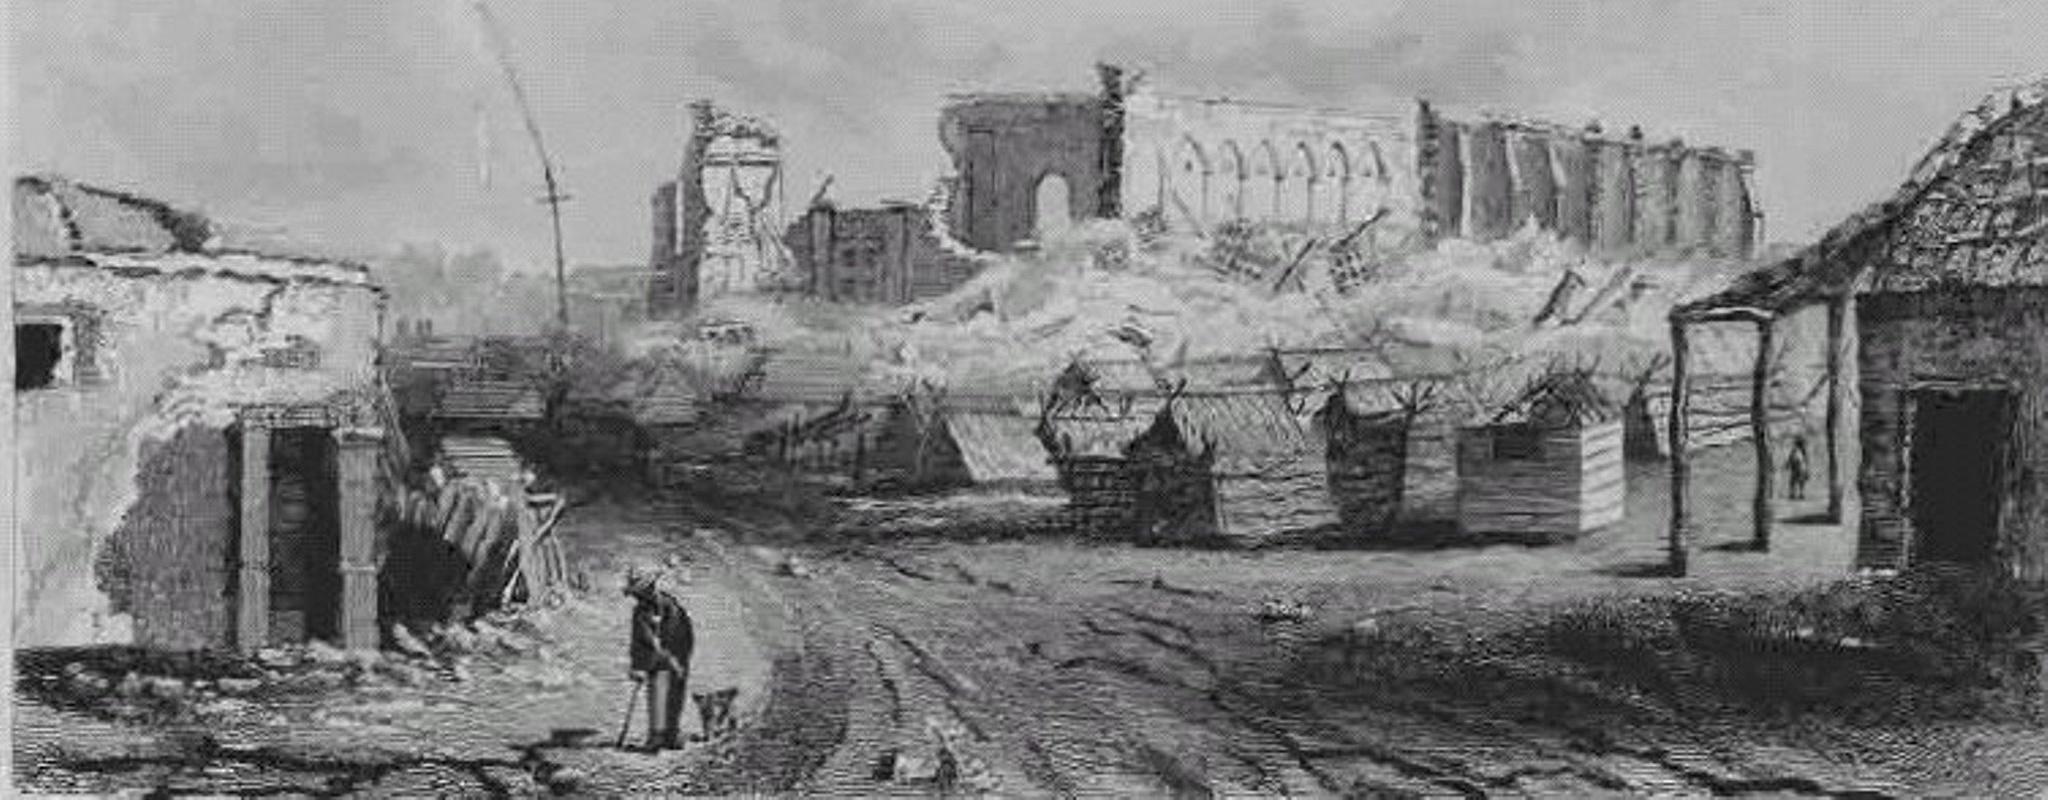 Terremoto 1835 Darwin slide